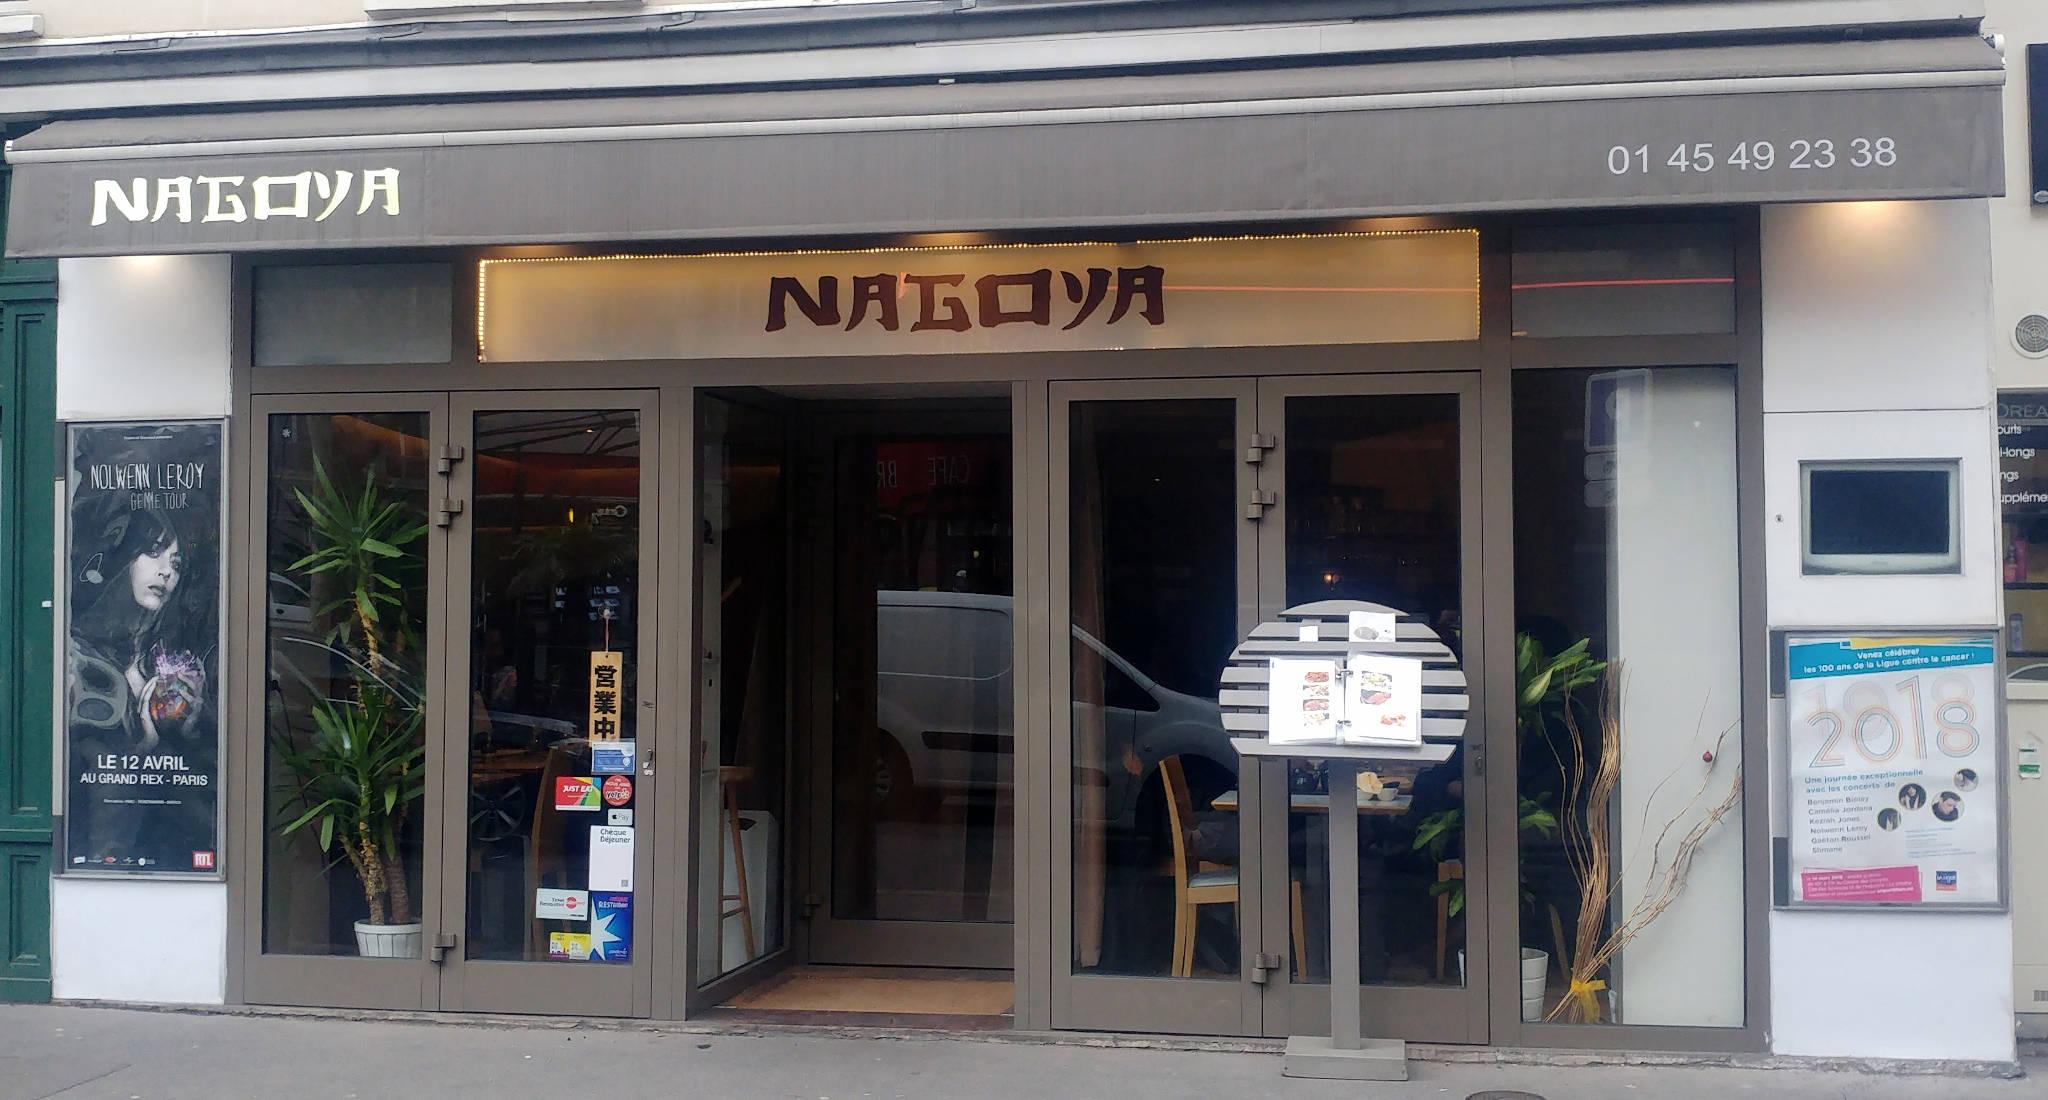 Nagoya à Paris(75)